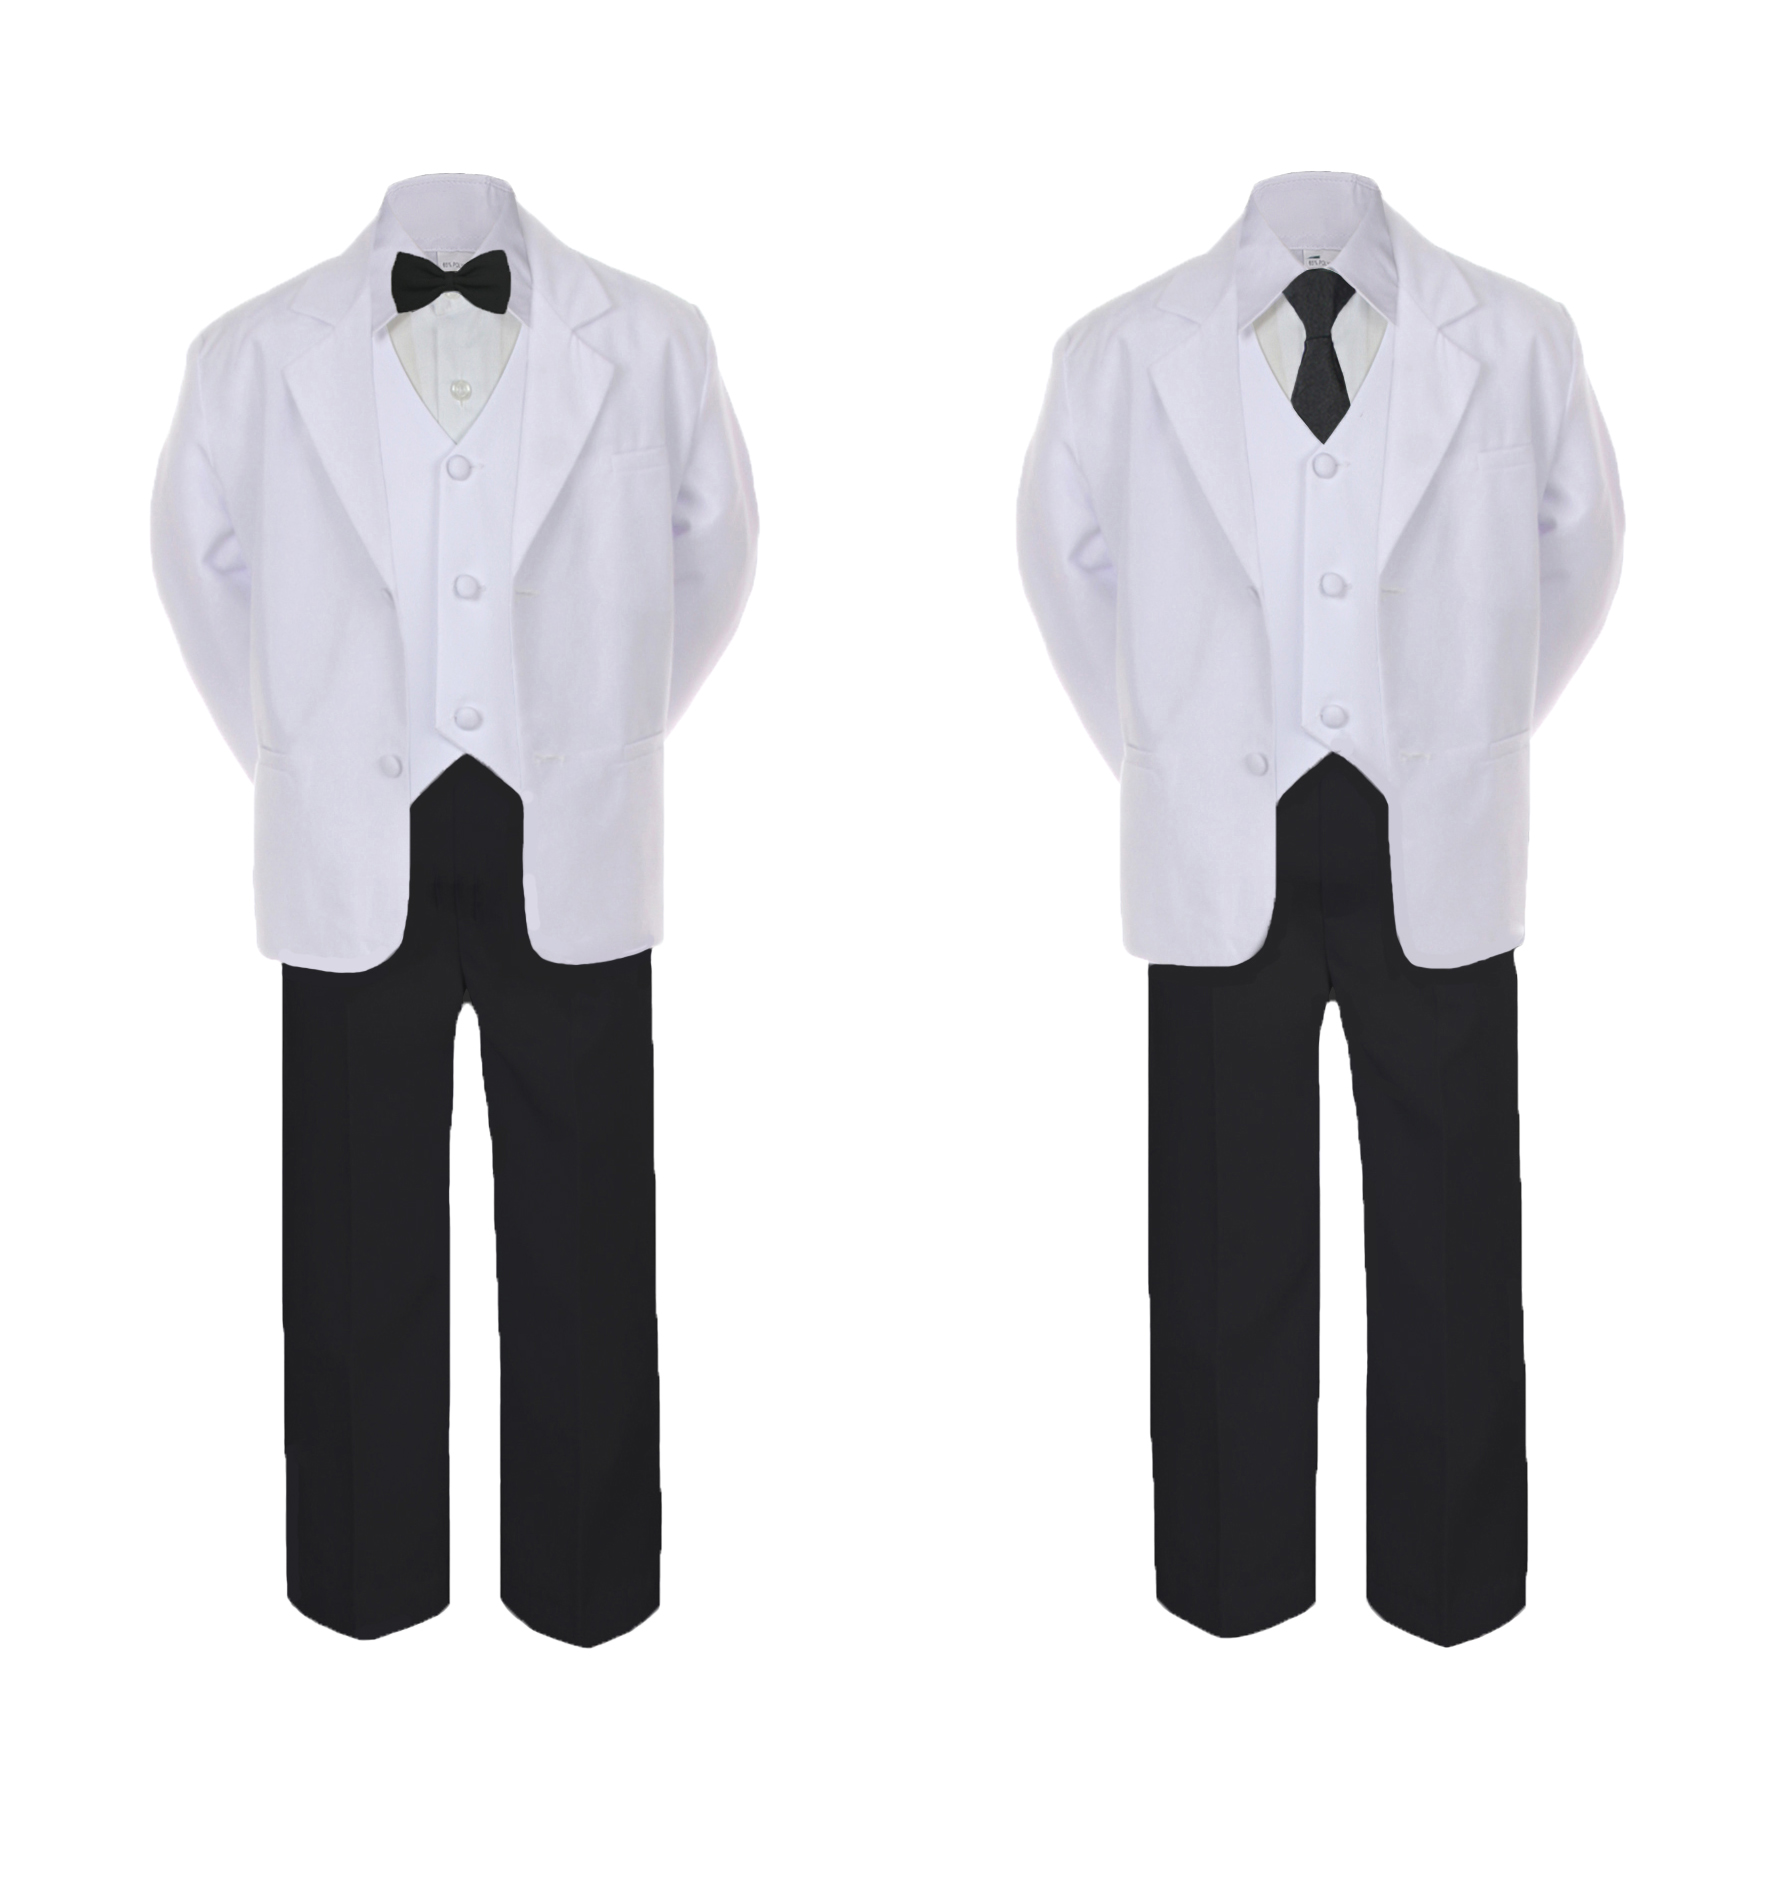 5pc Baby Toddler Boy Teen Formal White Black Bow Tie or Necktie Suit Set Sm-20